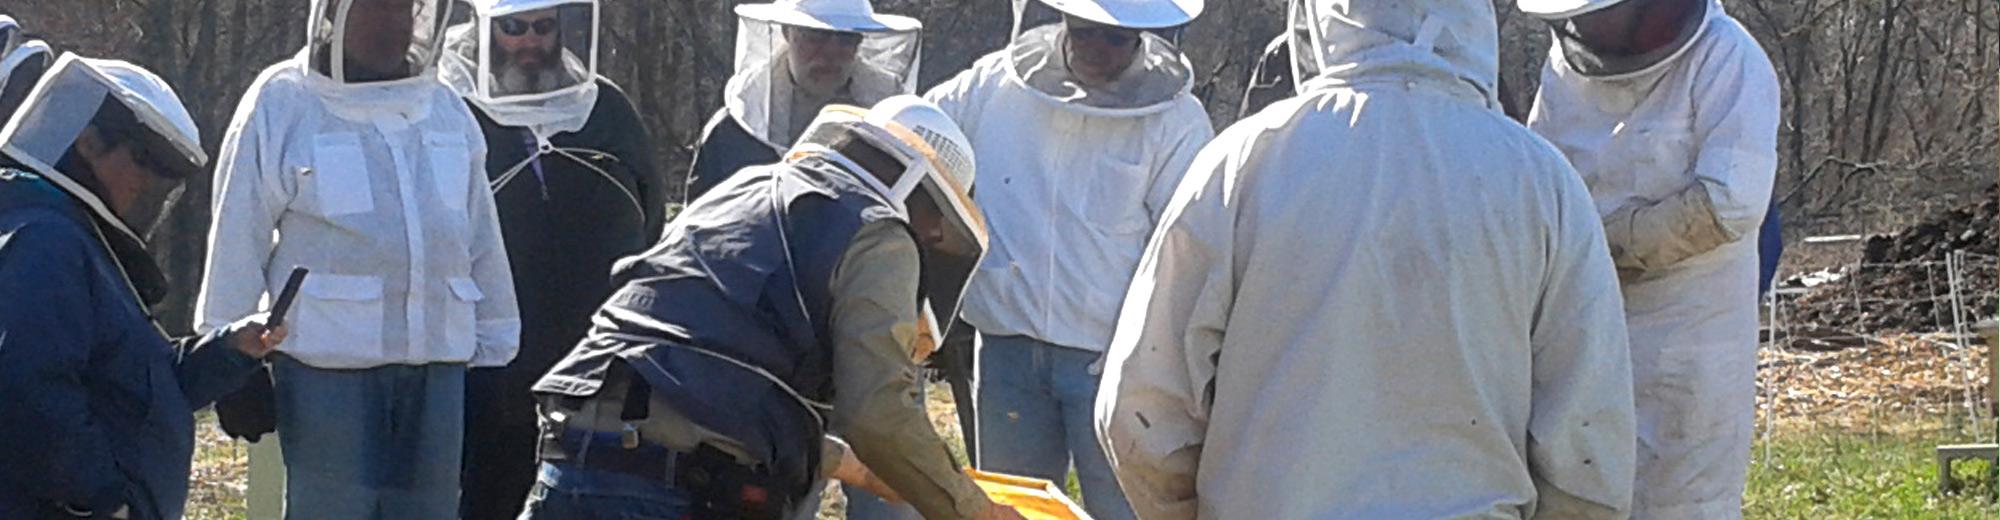 Bee Keeping workshops at Massaro Farms